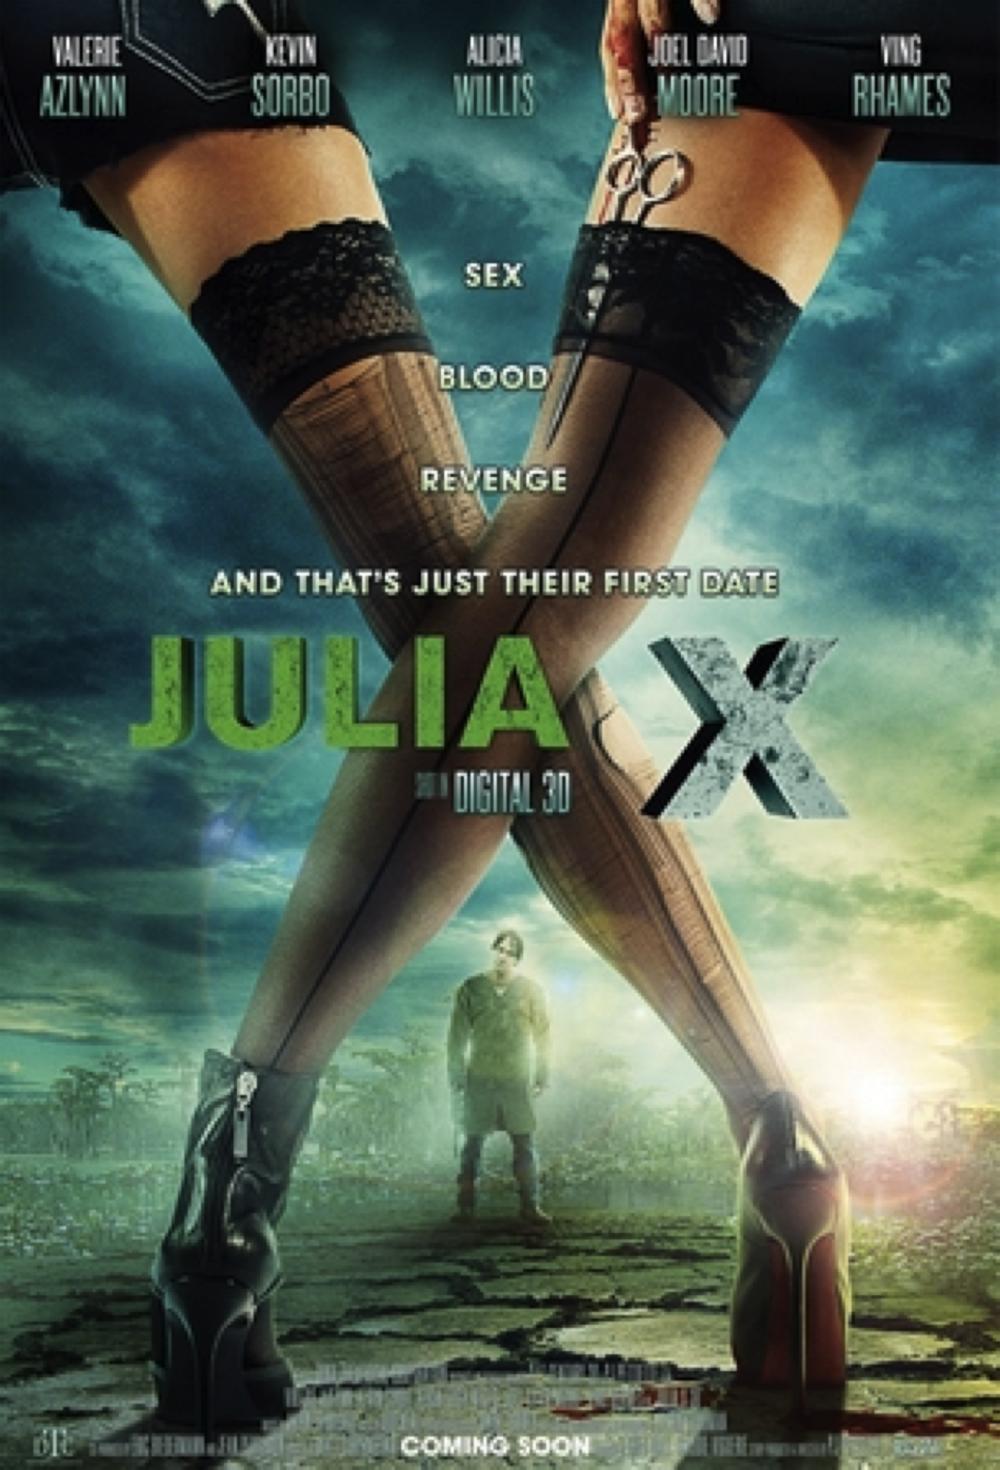 juliax.png